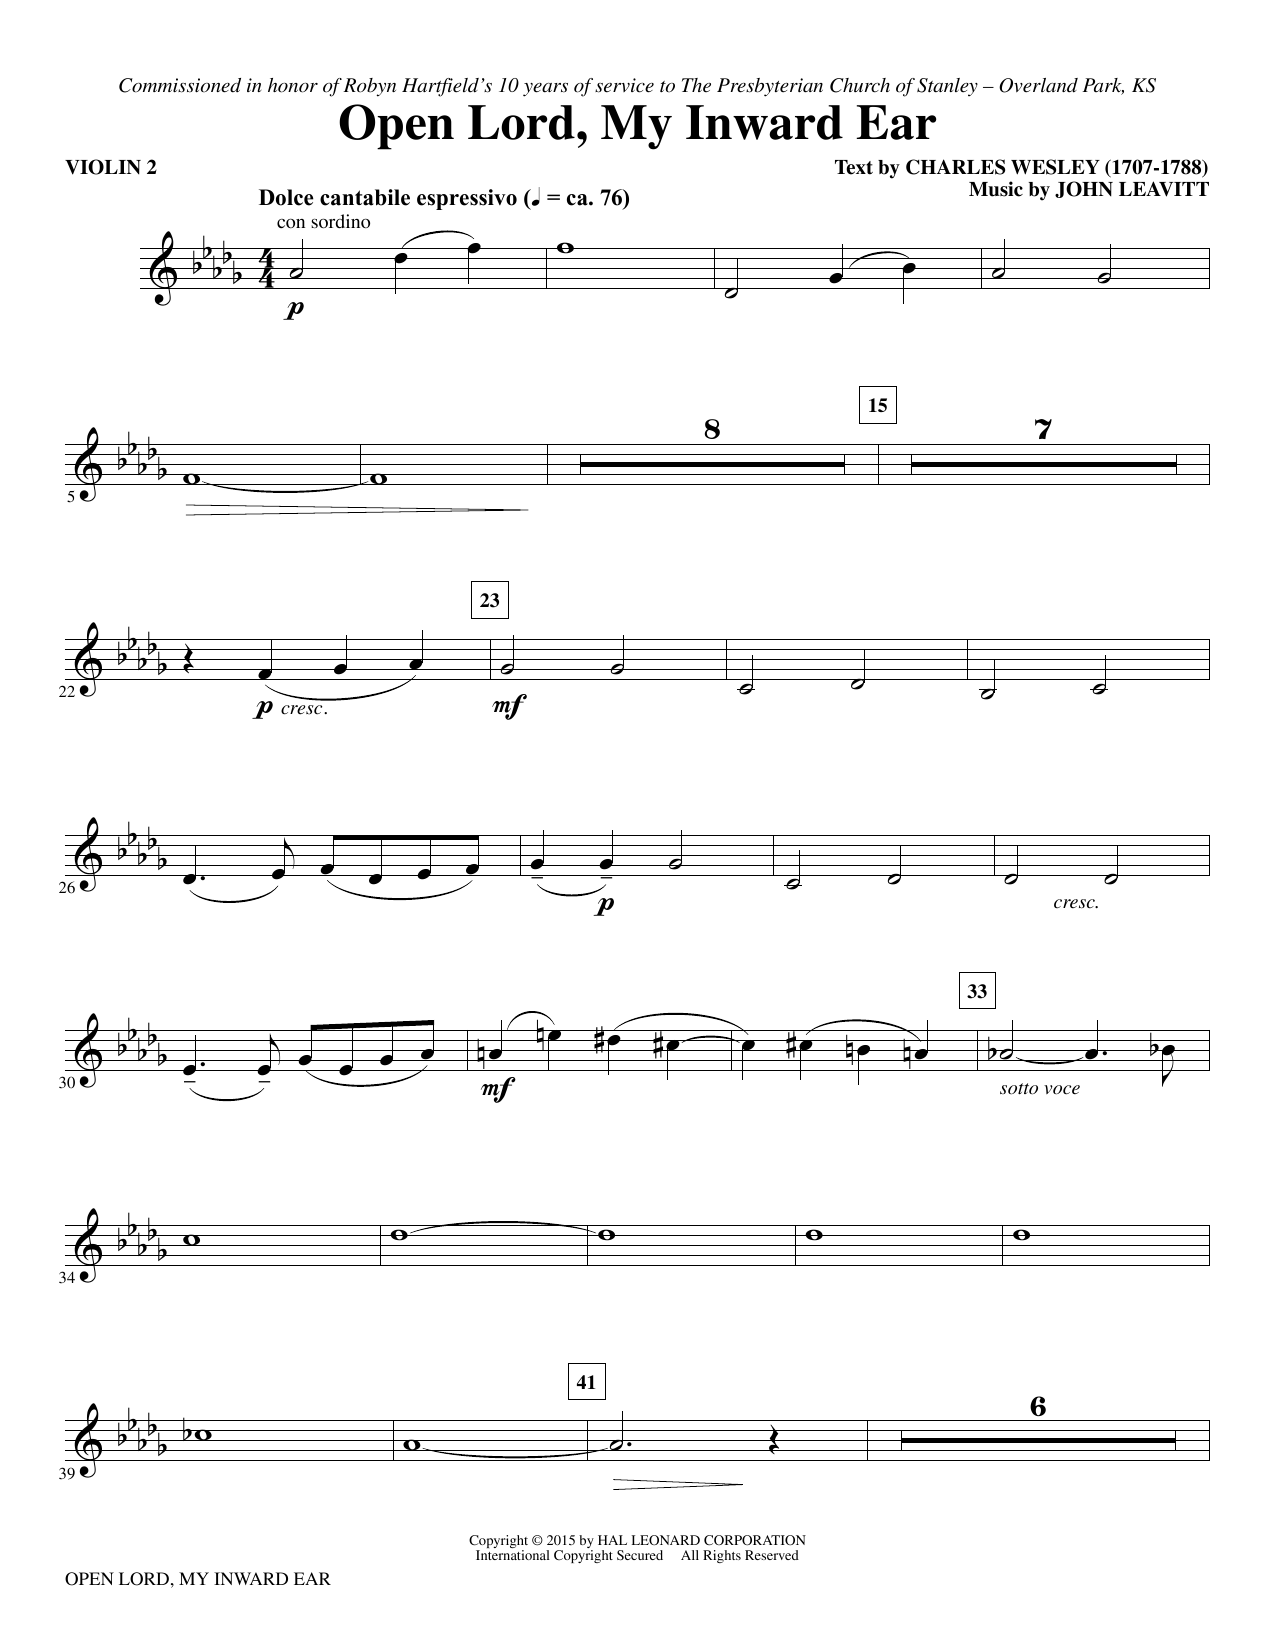 Open Lord, My Inward Ear - Violin 2 sheet music